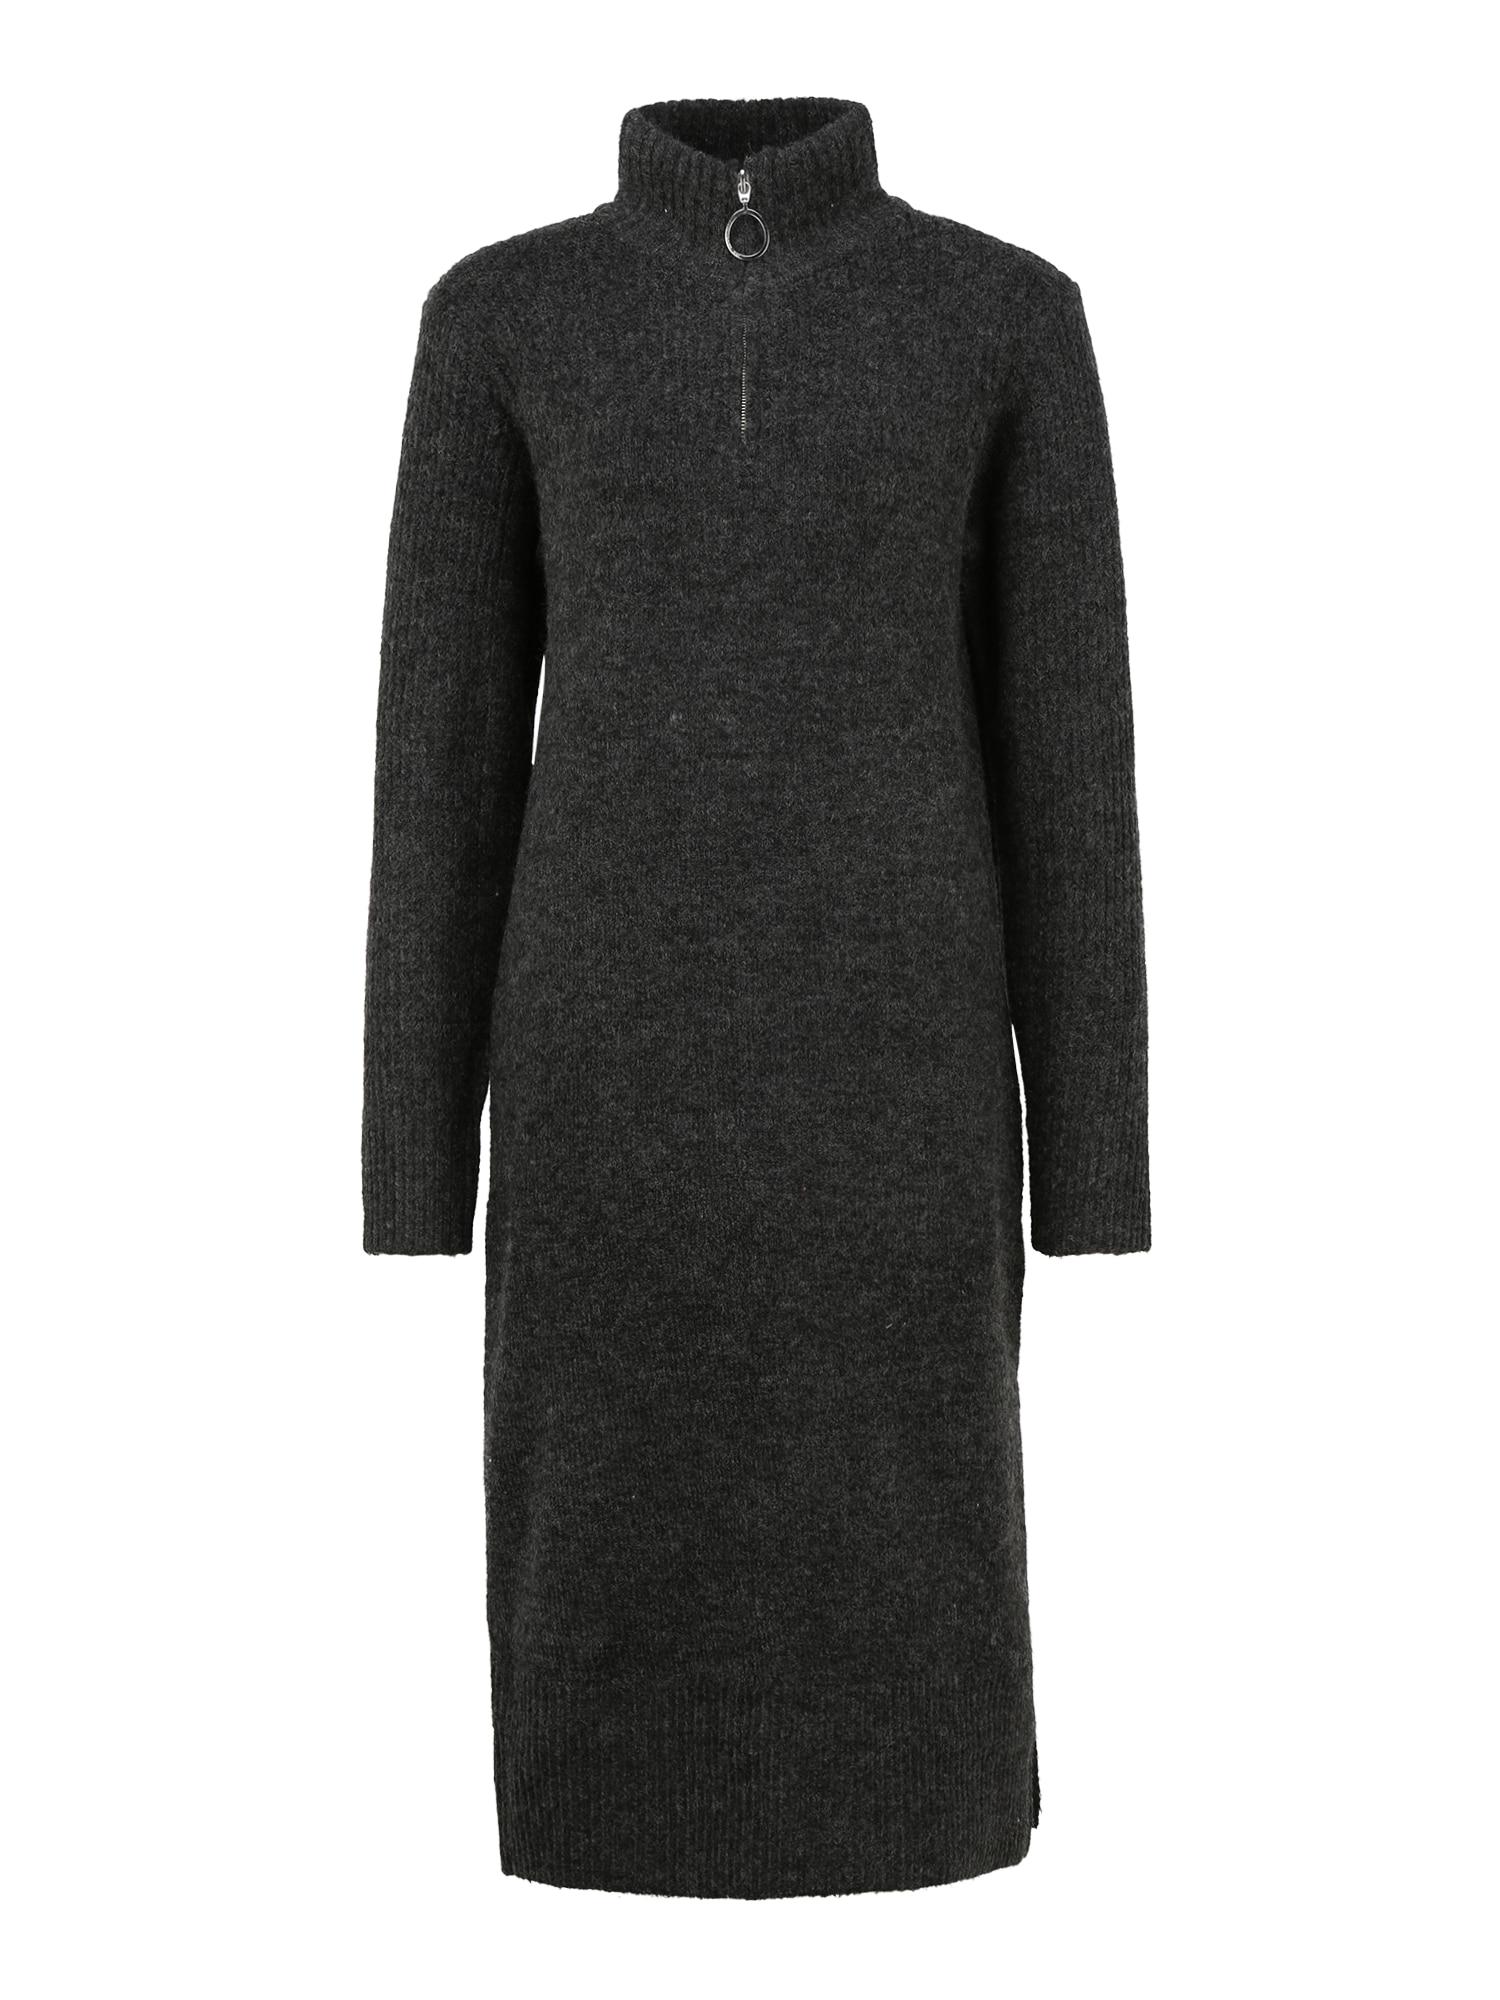 Noisy May (Petite) Megzta suknelė